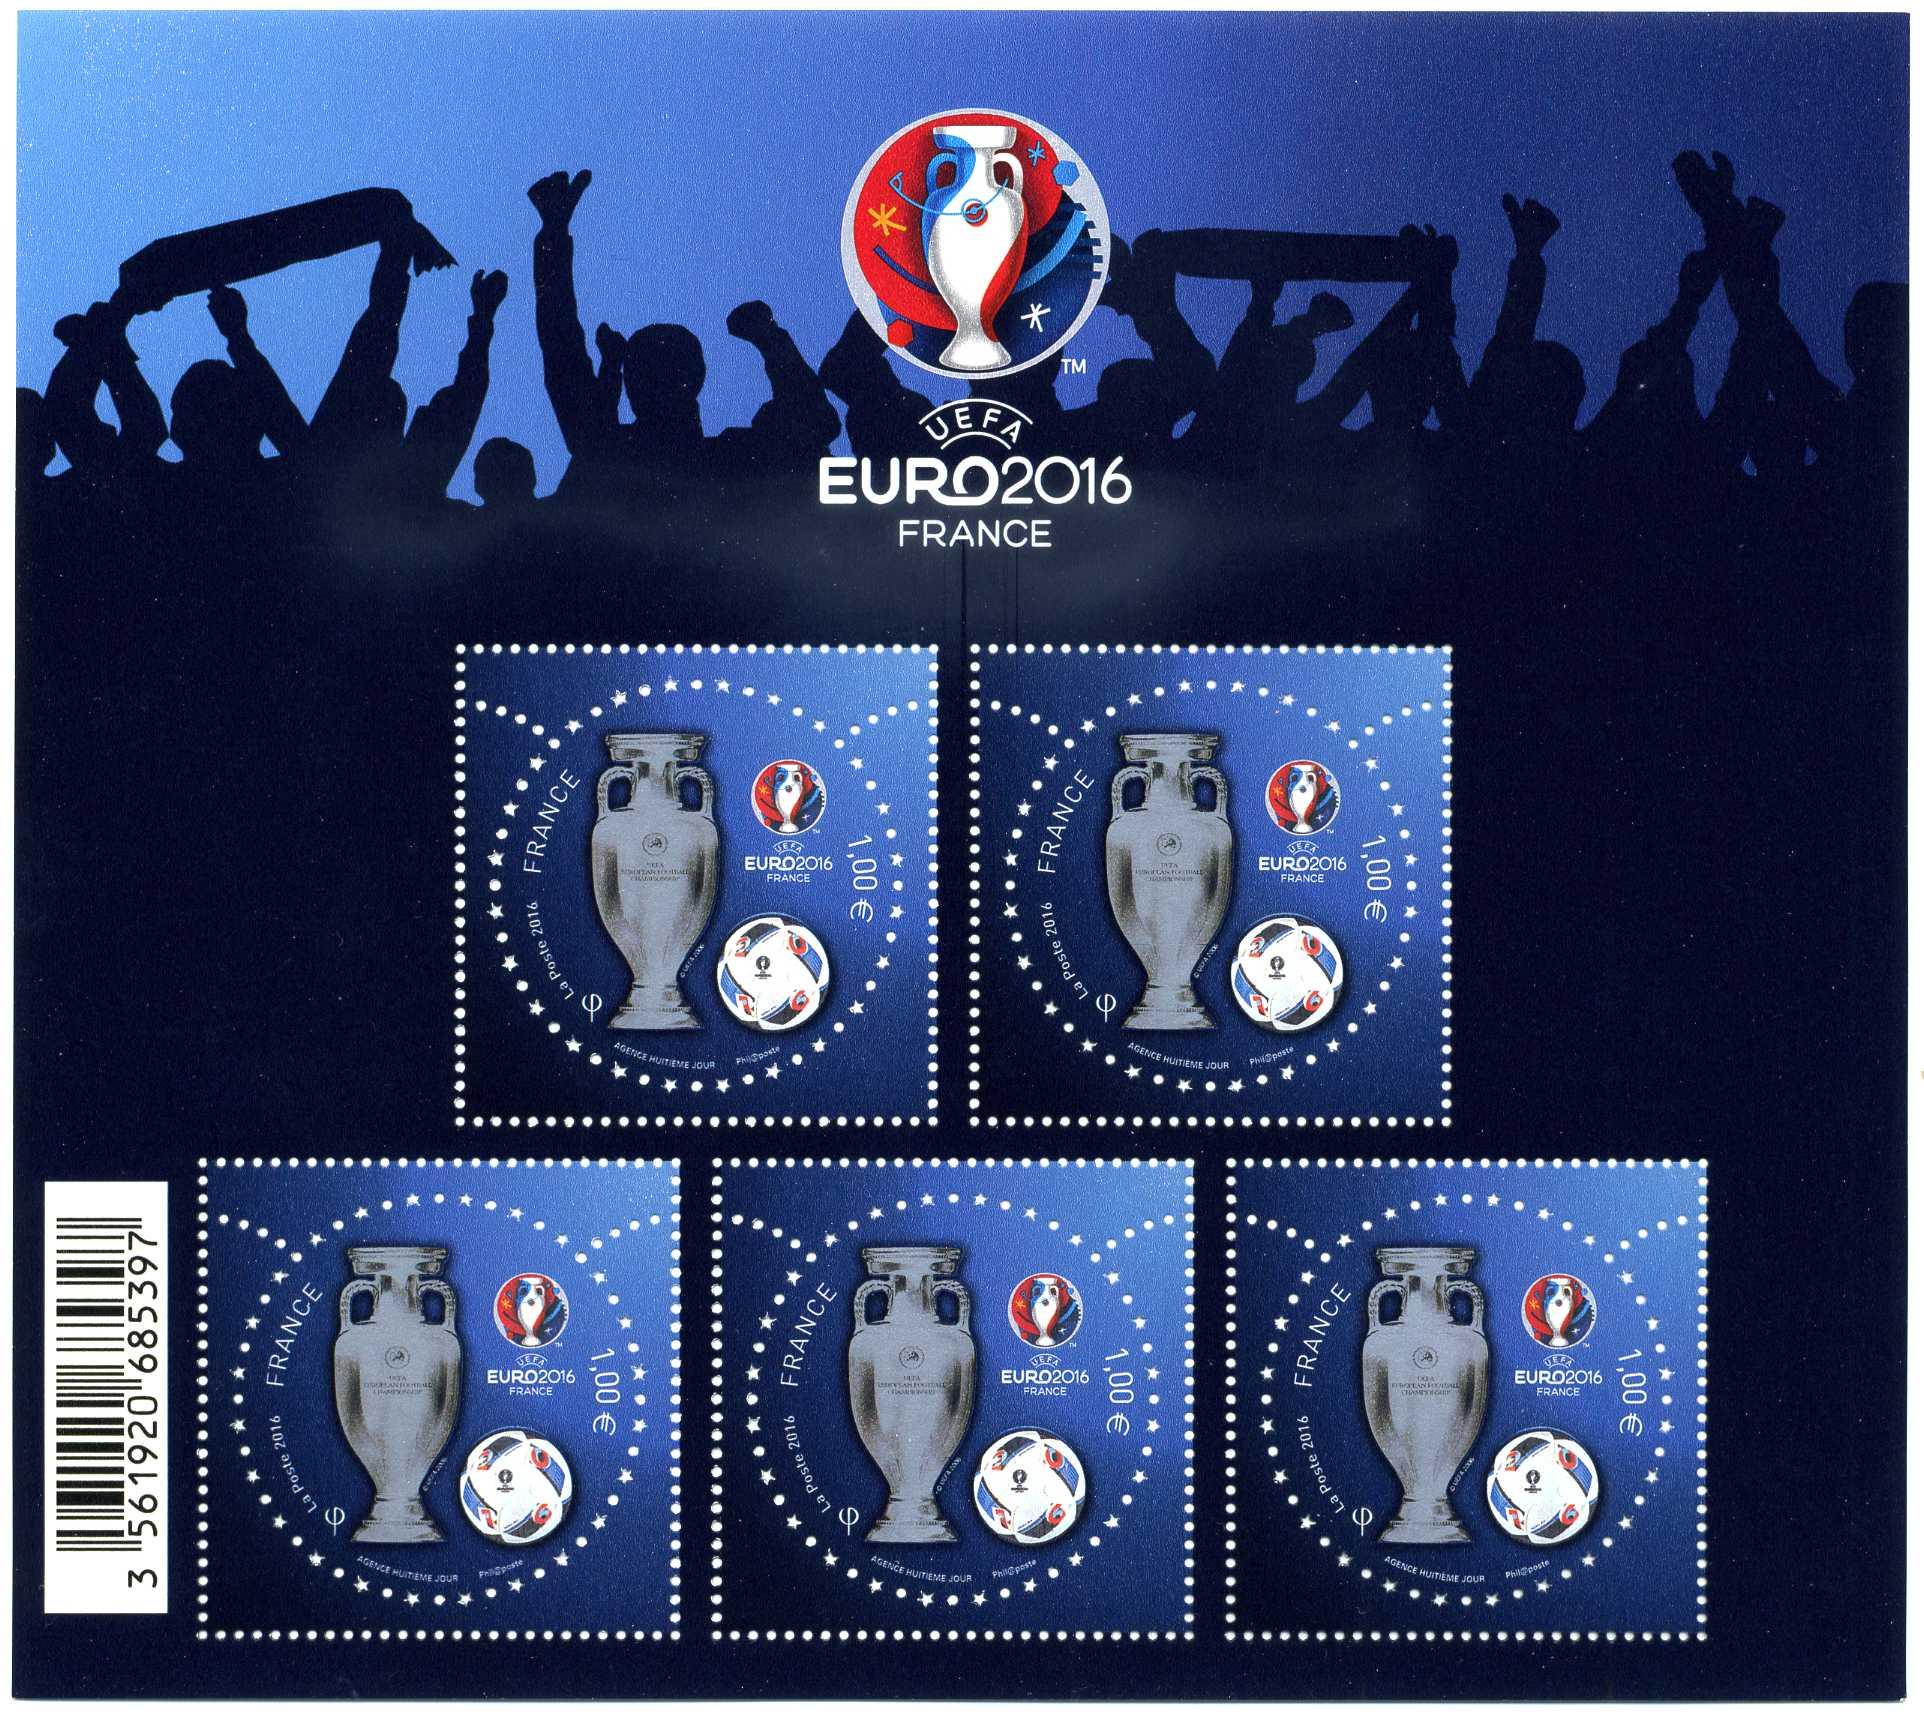 FR 236 2016 UEFA EURO2016.jpg